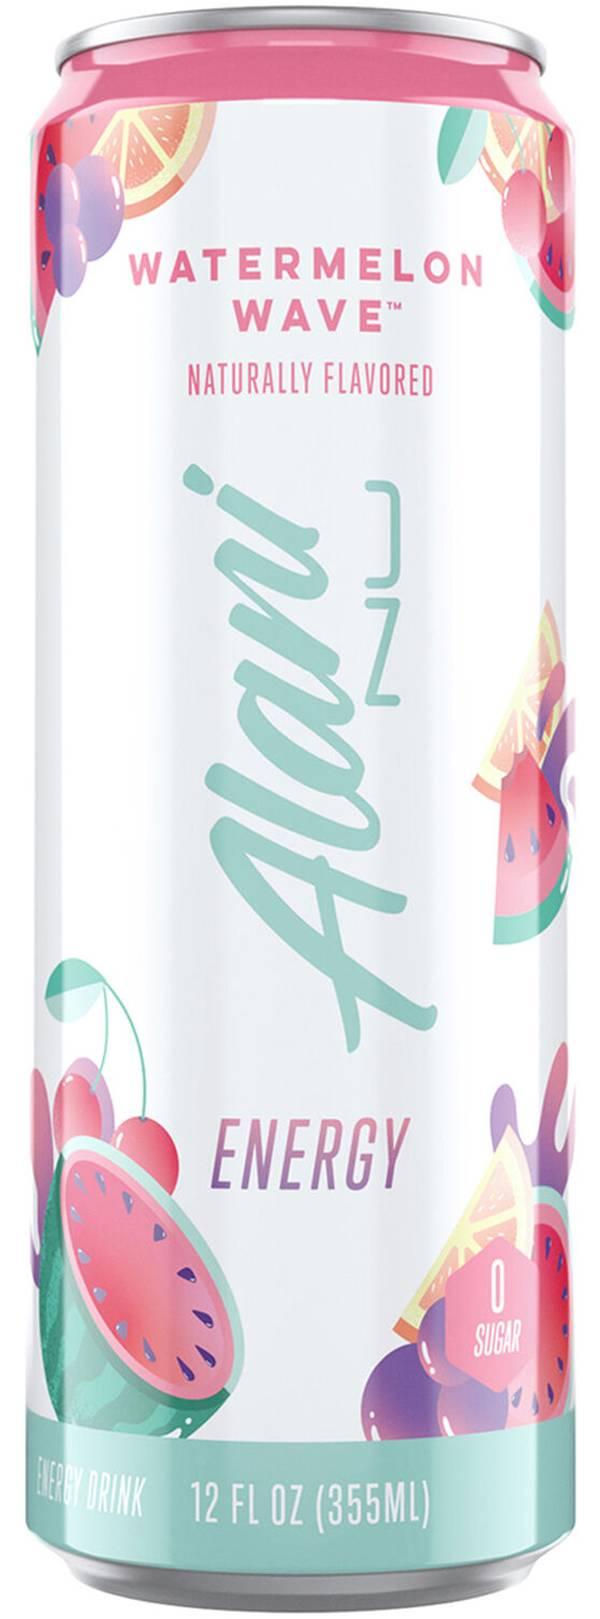 Alani Nu 12 oz. Energy Drink - Watermelon Wave product image